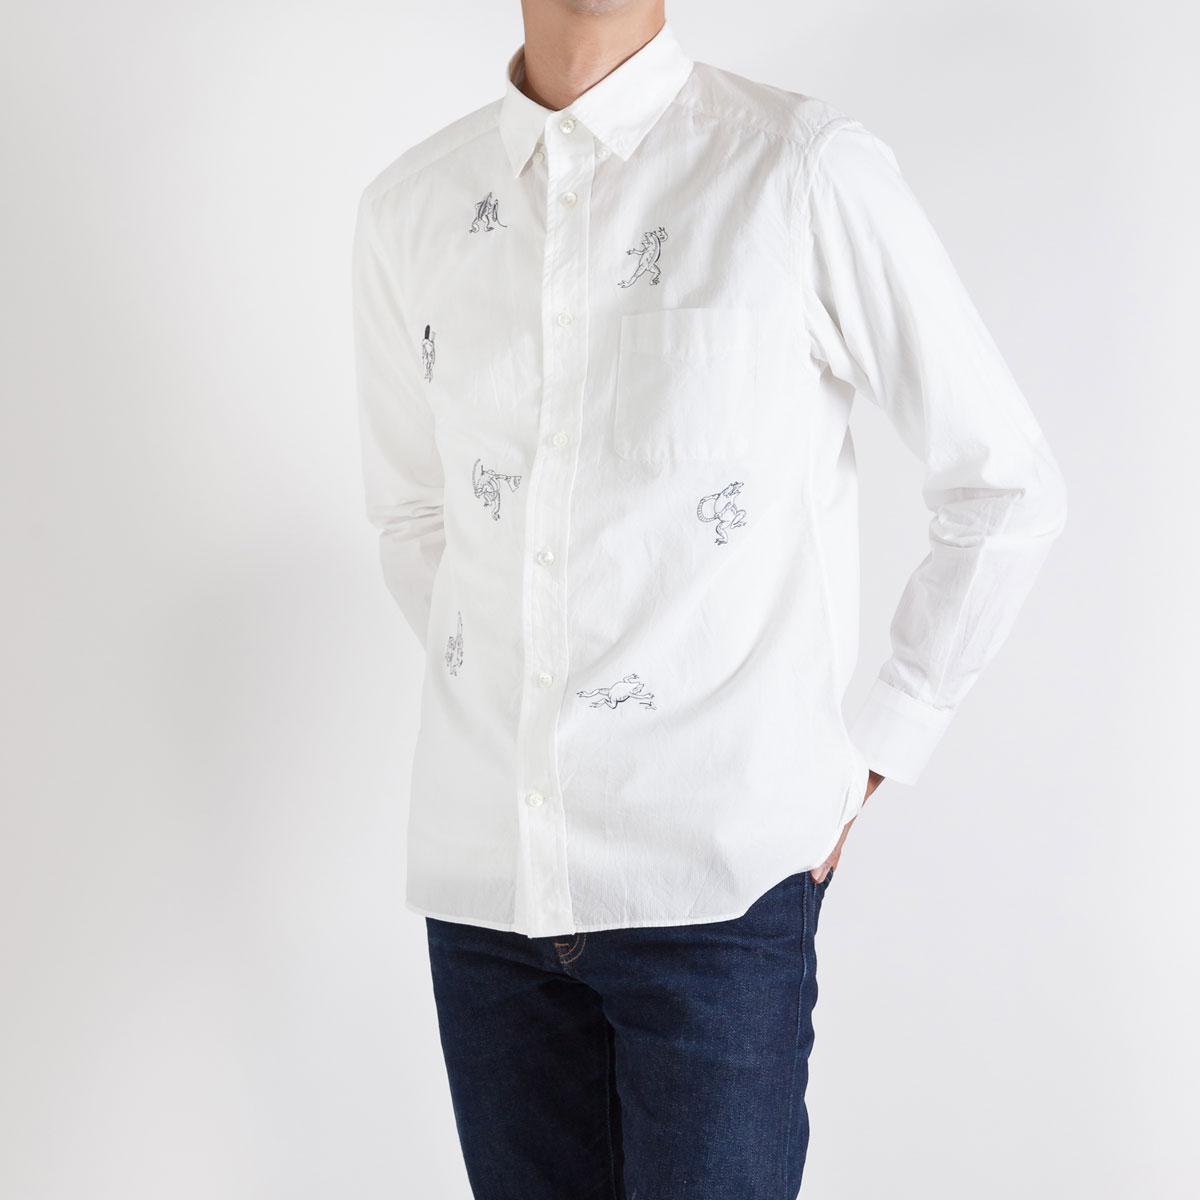 KY17-680M/メンズシャツ[播州織]/蛙